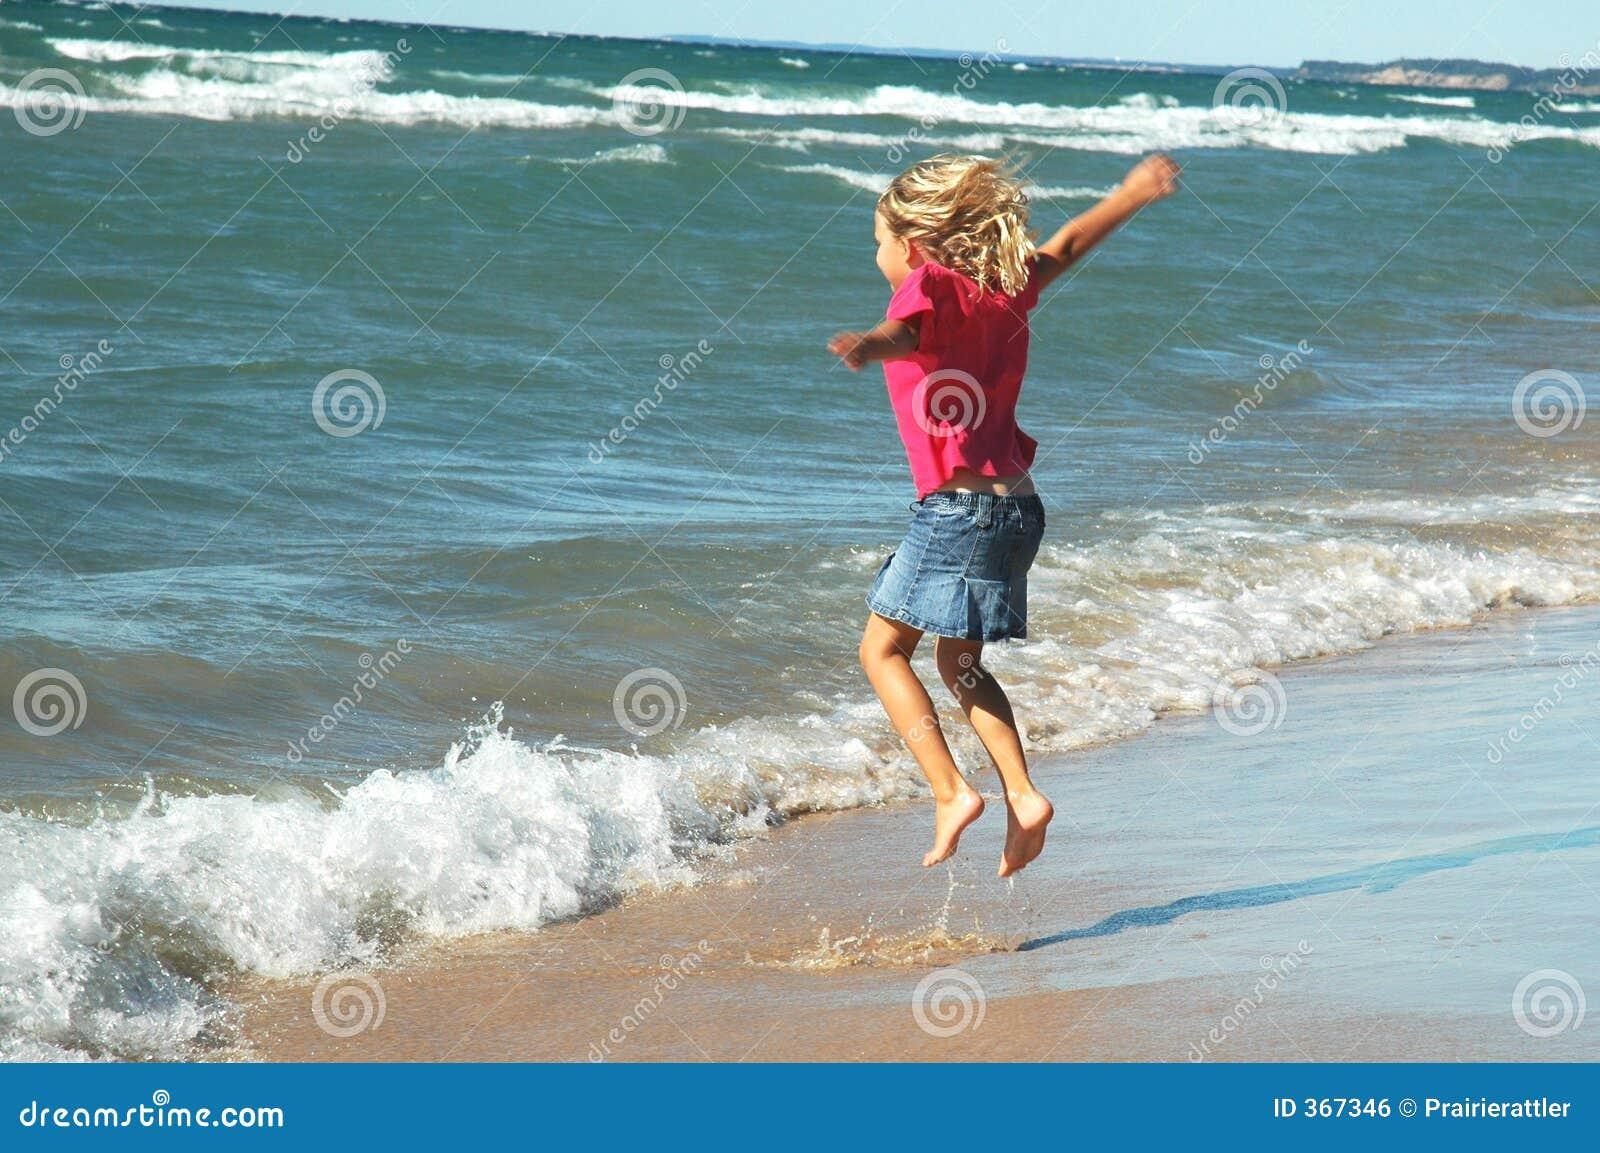 Surf Jumper Girl